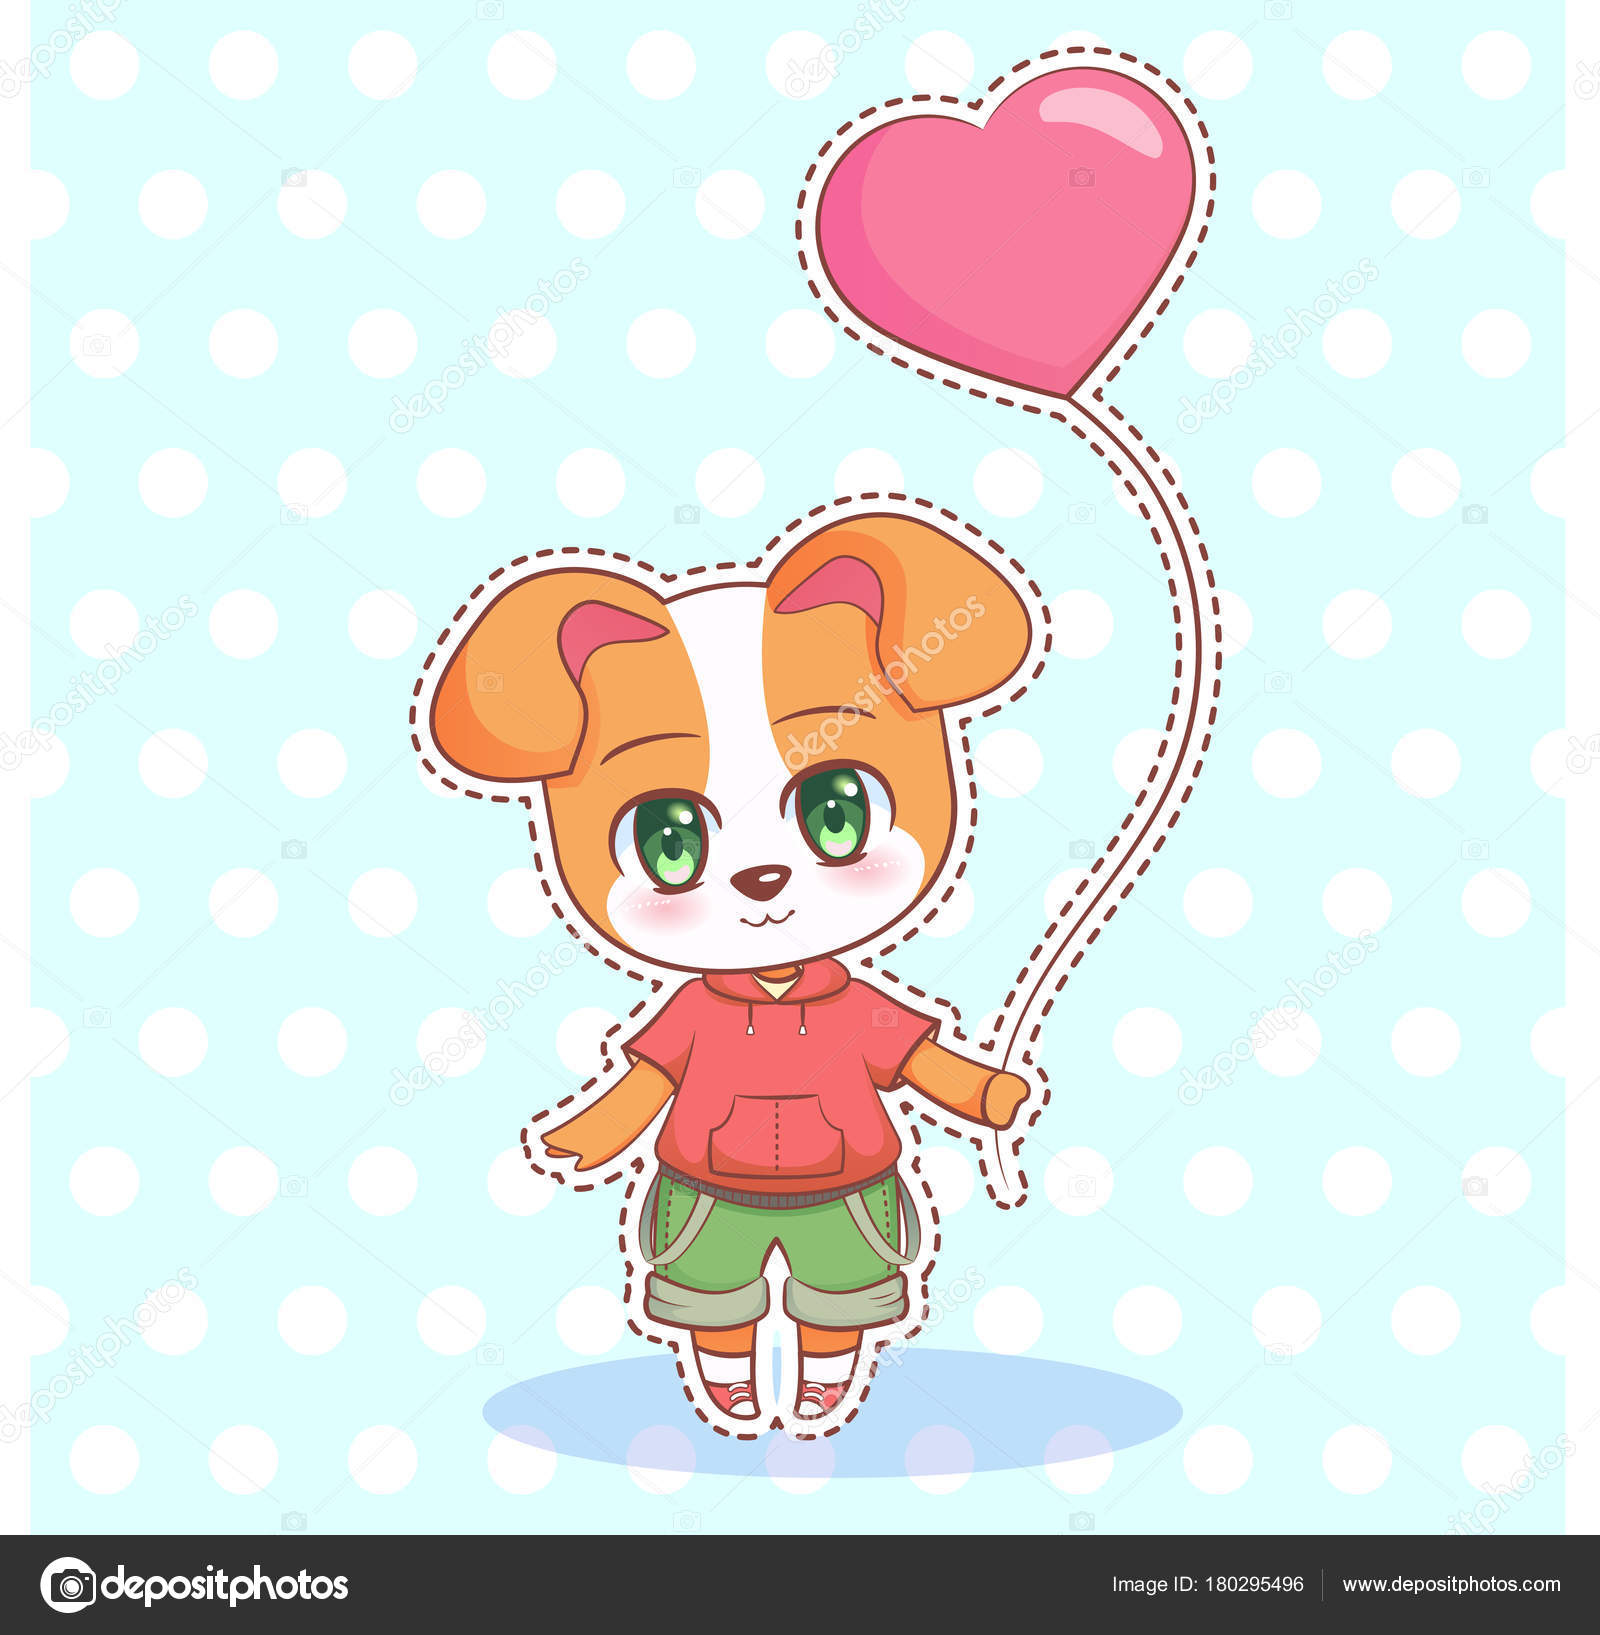 sweet little cute kawaii anime cartoon puppy dog boy and girl with